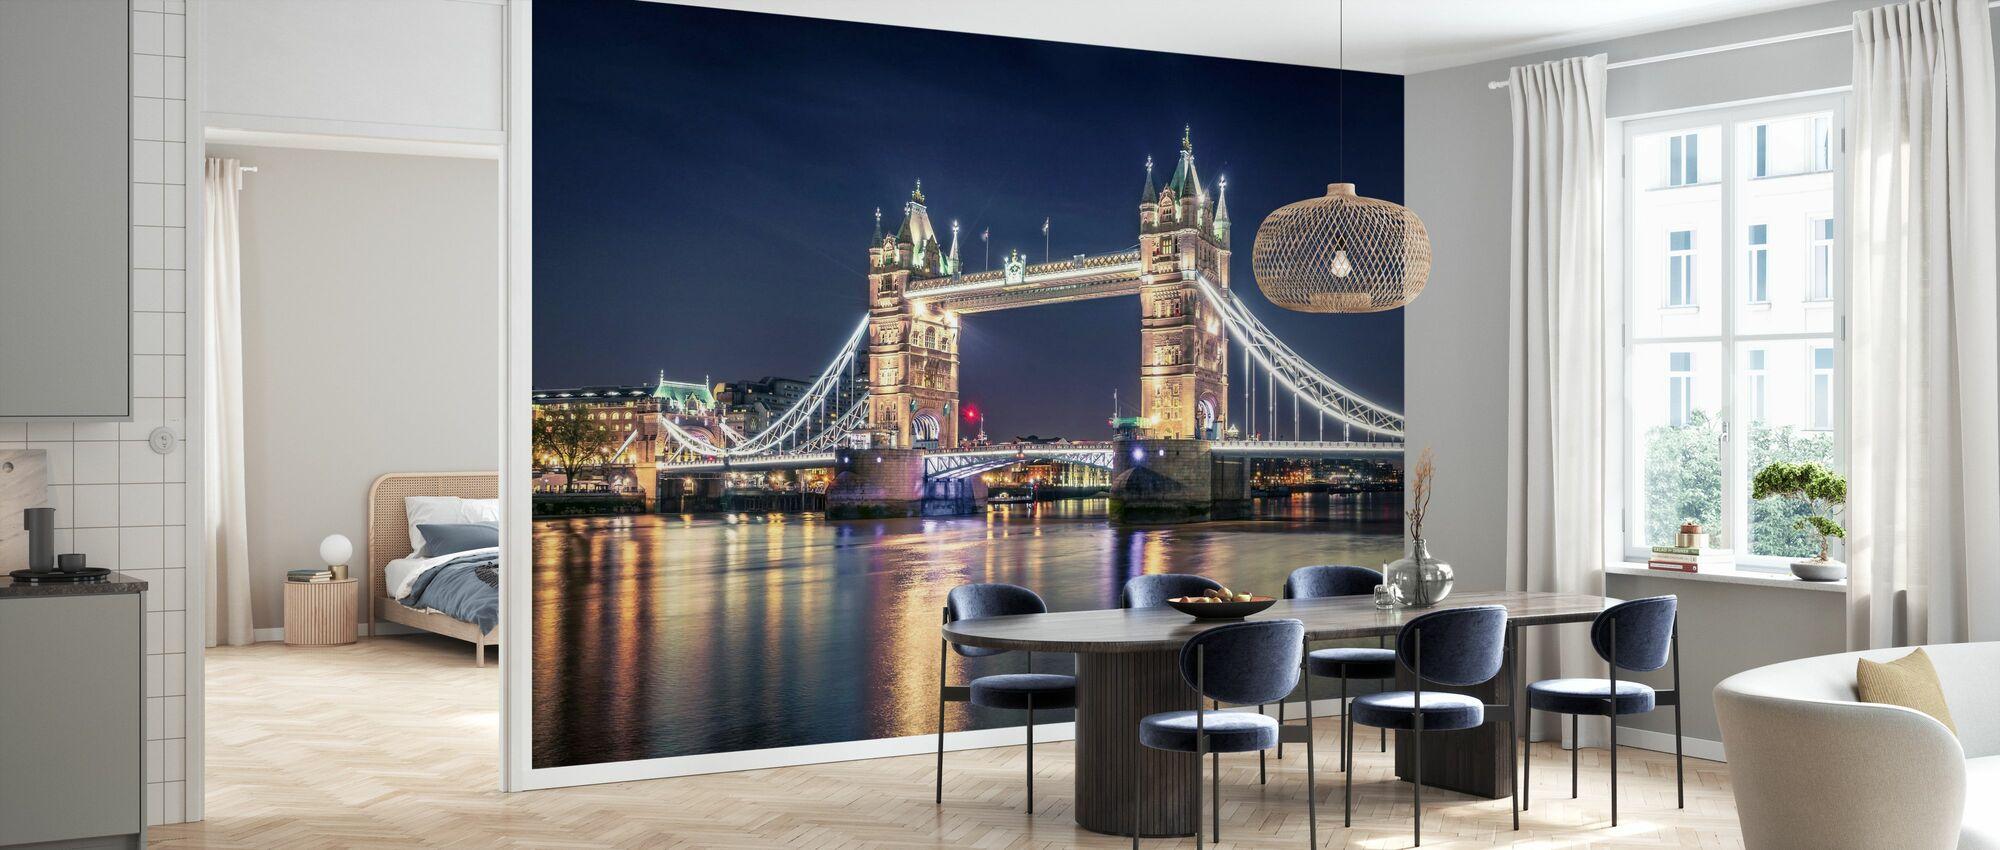 Night at the Tower Bridge - Wallpaper - Kitchen